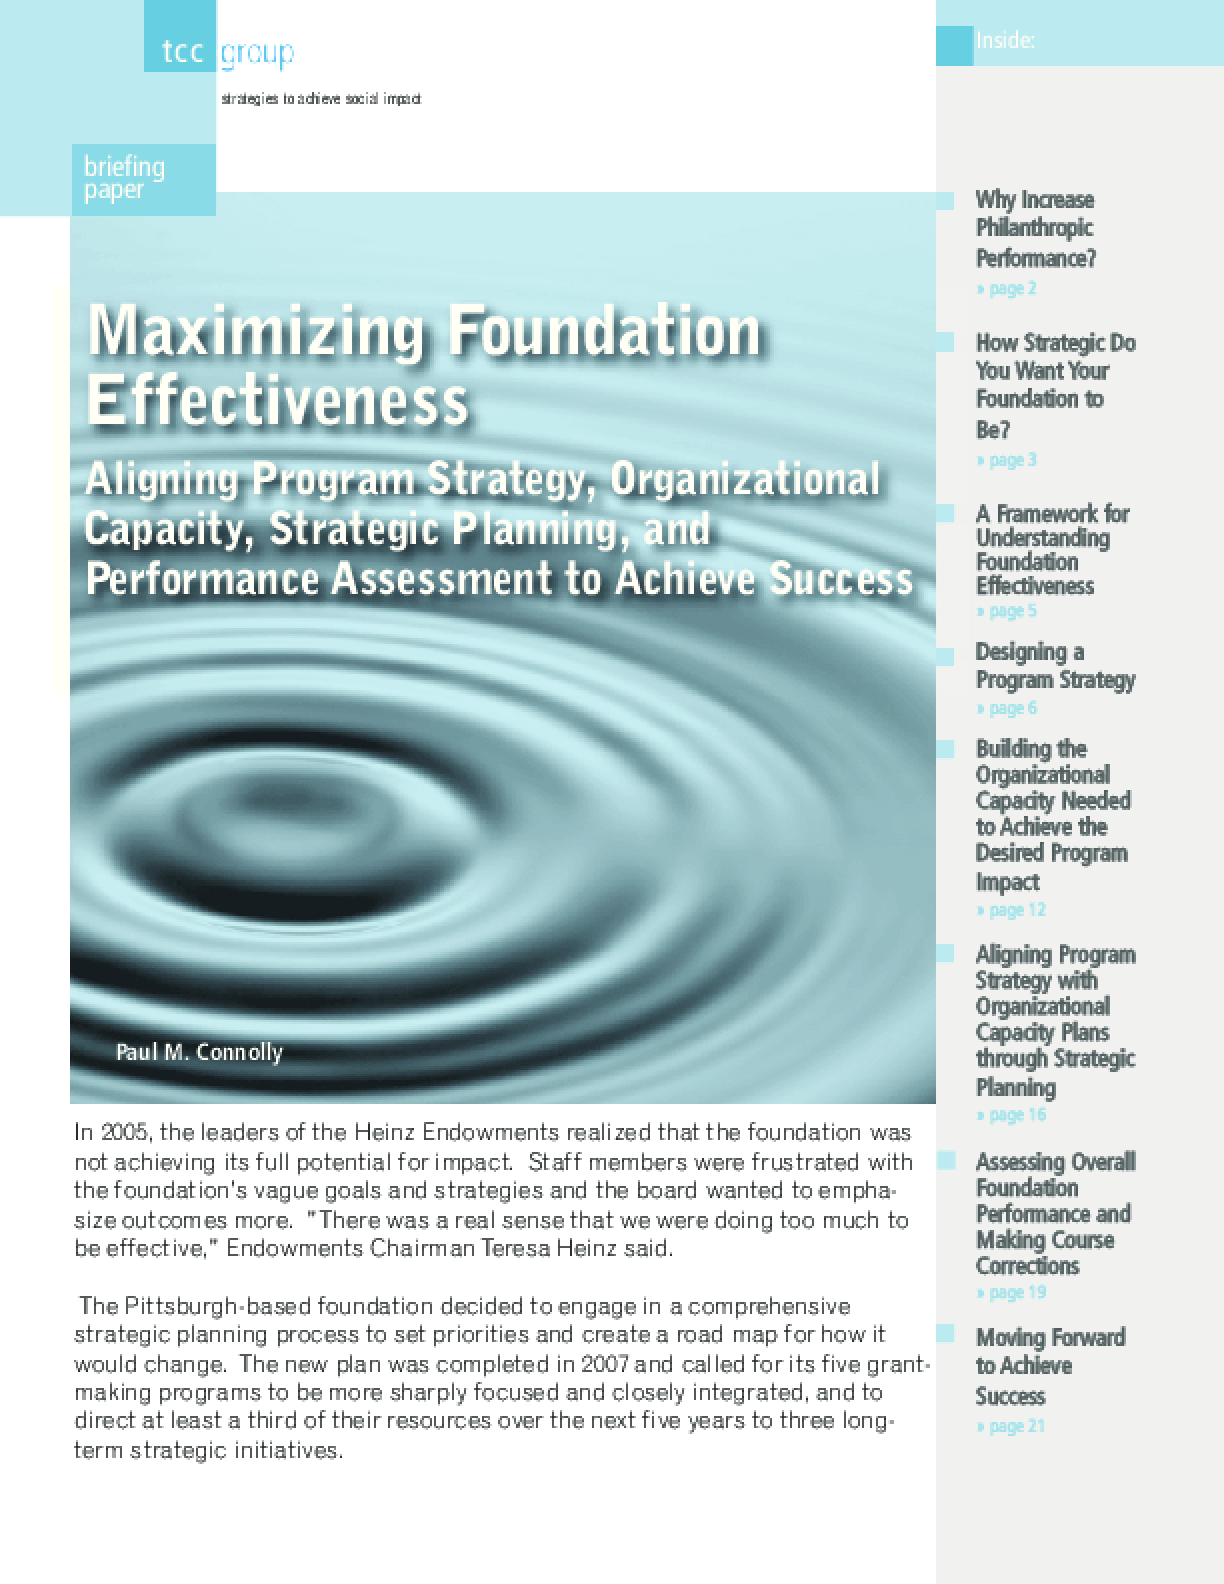 Maximizing Foundation Effectiveness: Aligning Program Strategy, Organizational Capacity, Strategic Planning, and Performance Assessment to Achieve Success